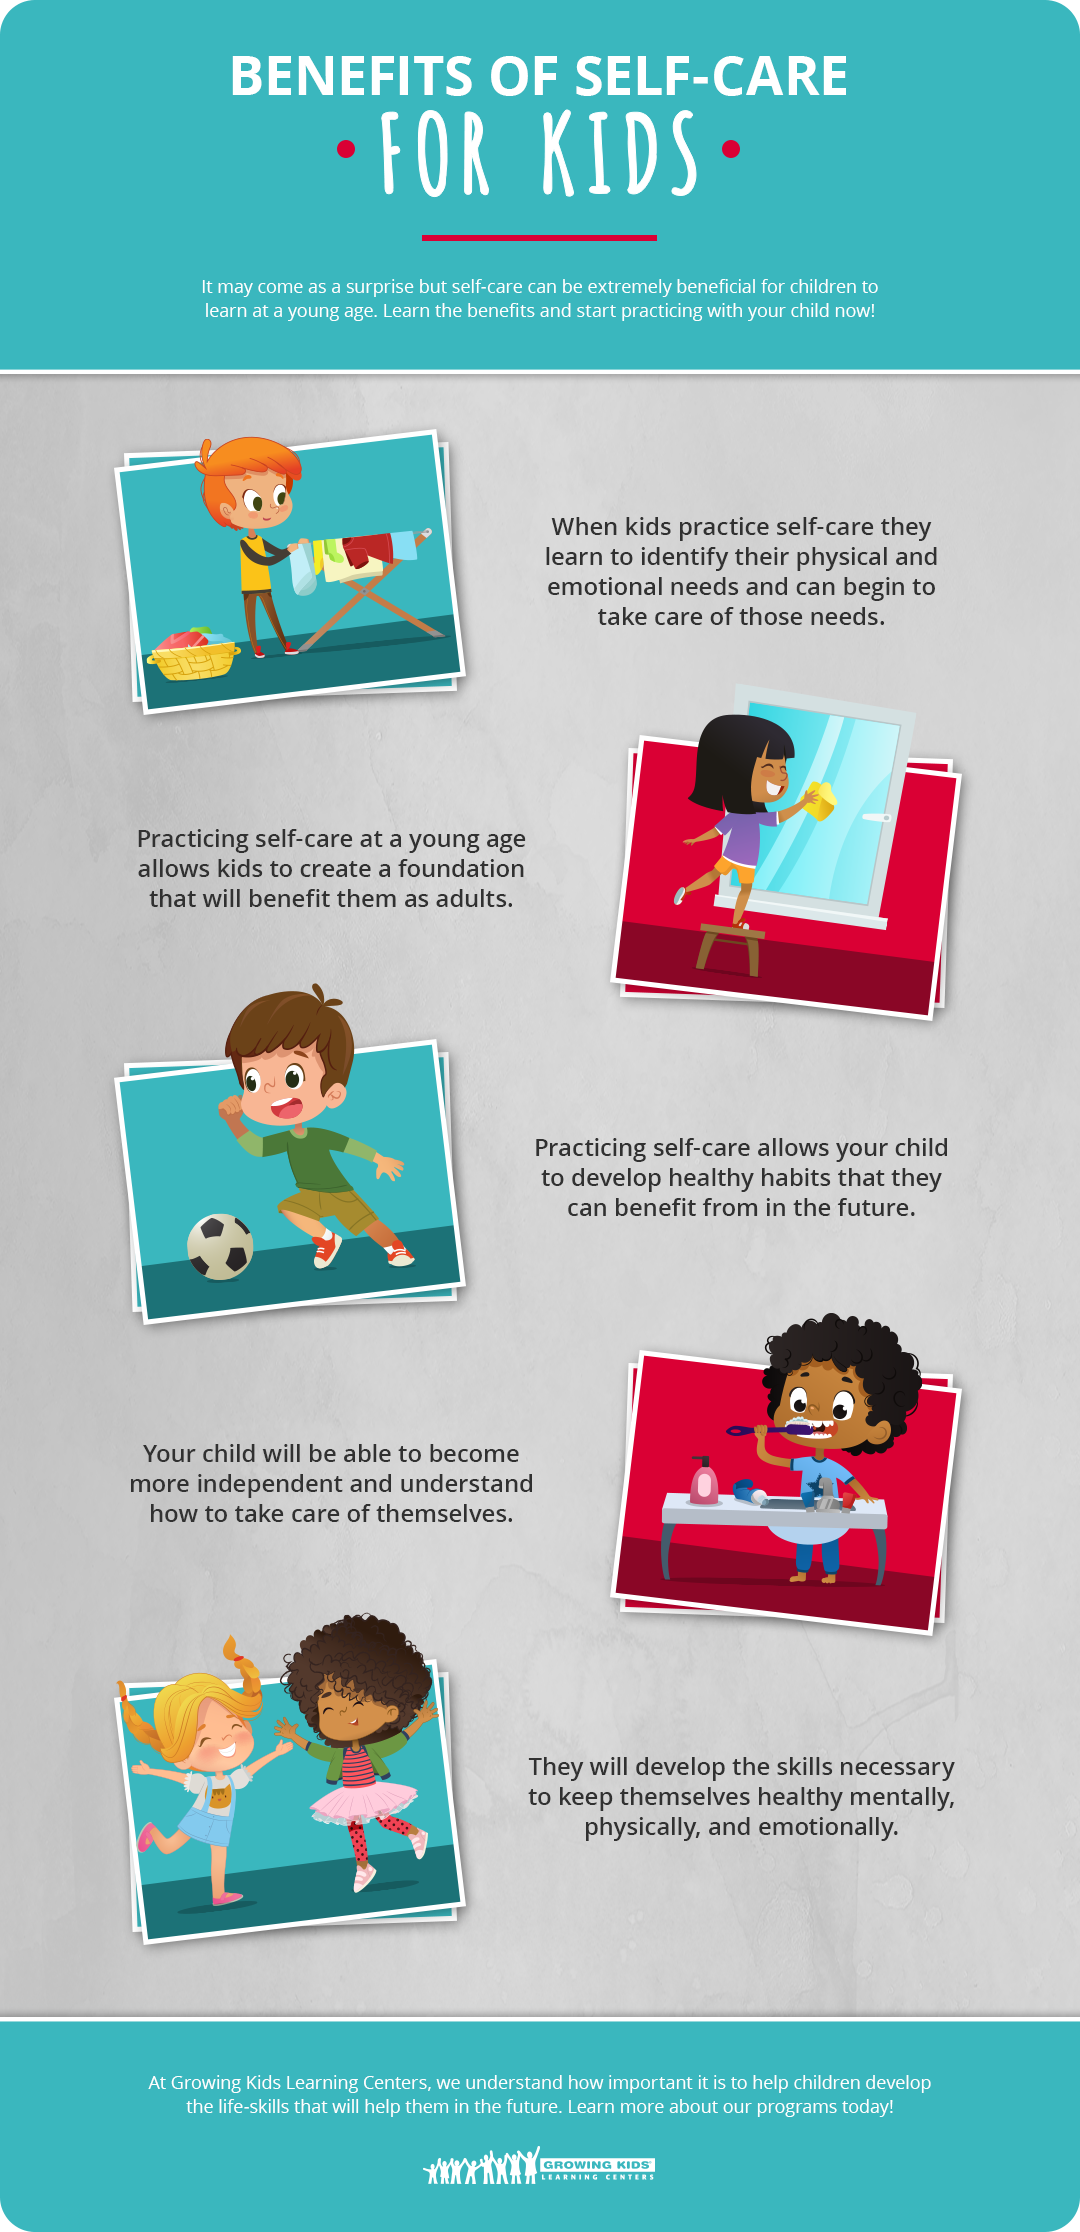 #Kids #Self-care #Tips #Self-care Tips